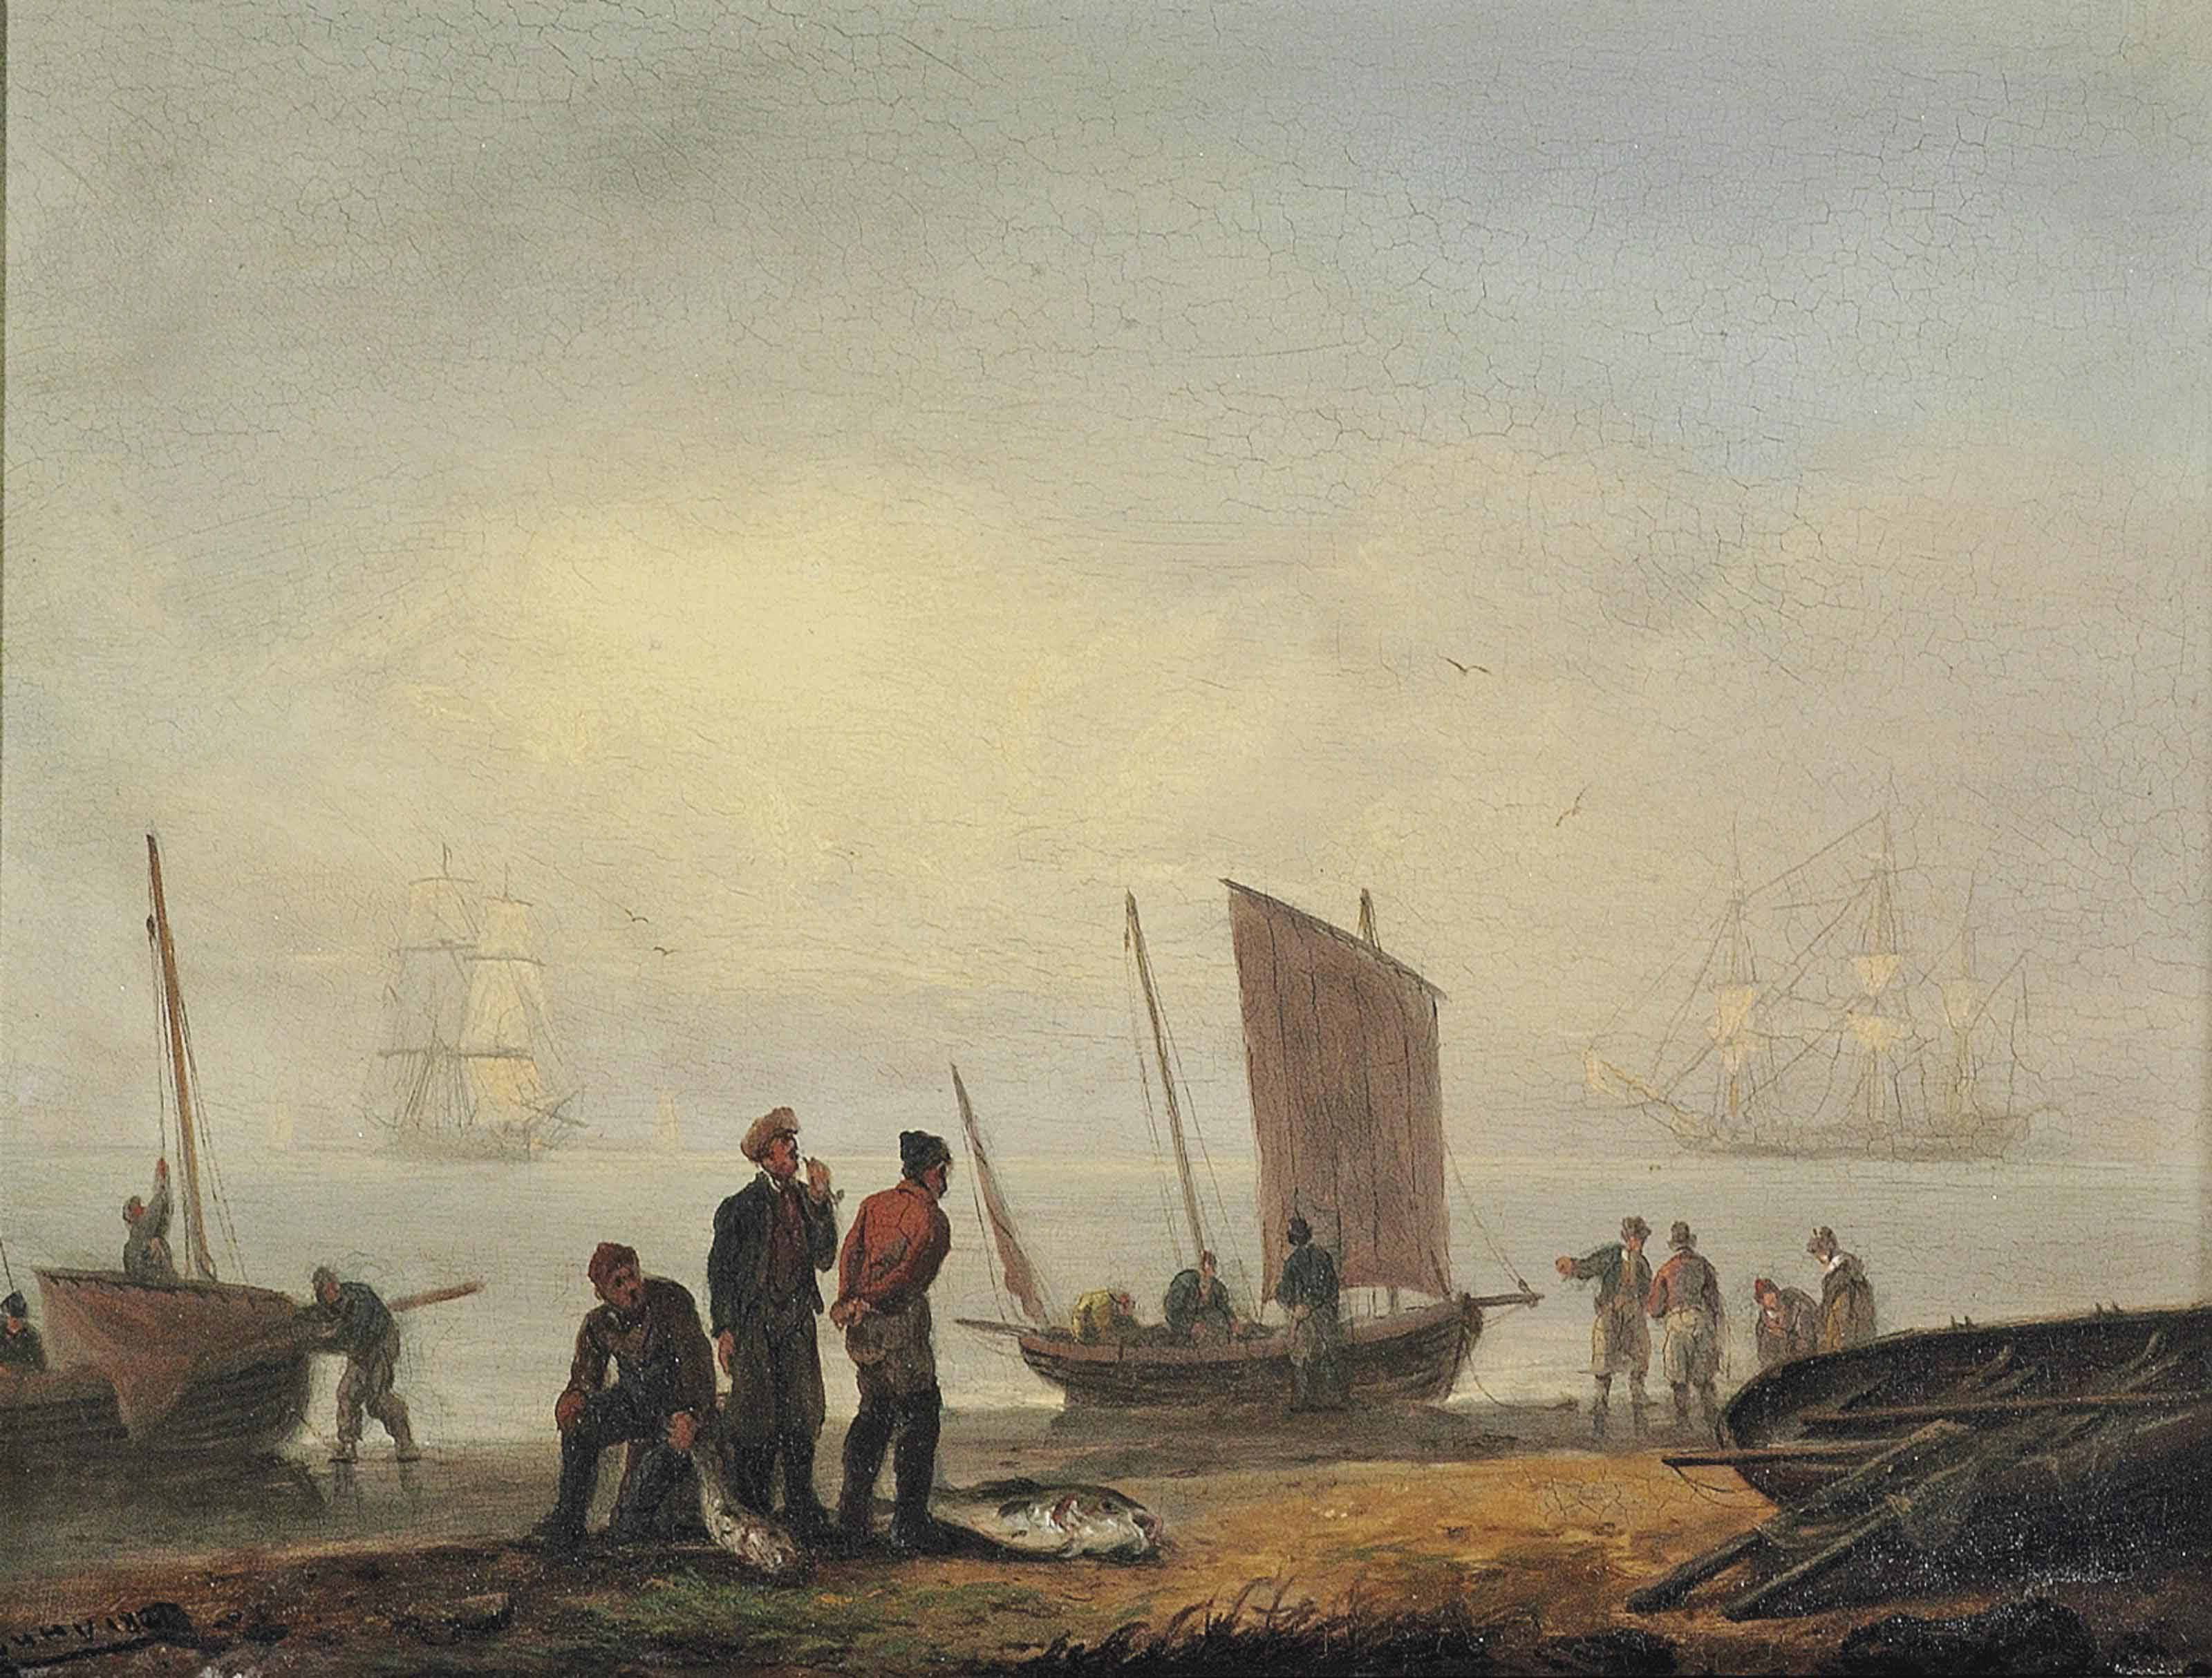 Thomas Luny (St. Ewe, Cornwall 1759-1837 Teignmouth, Devon)